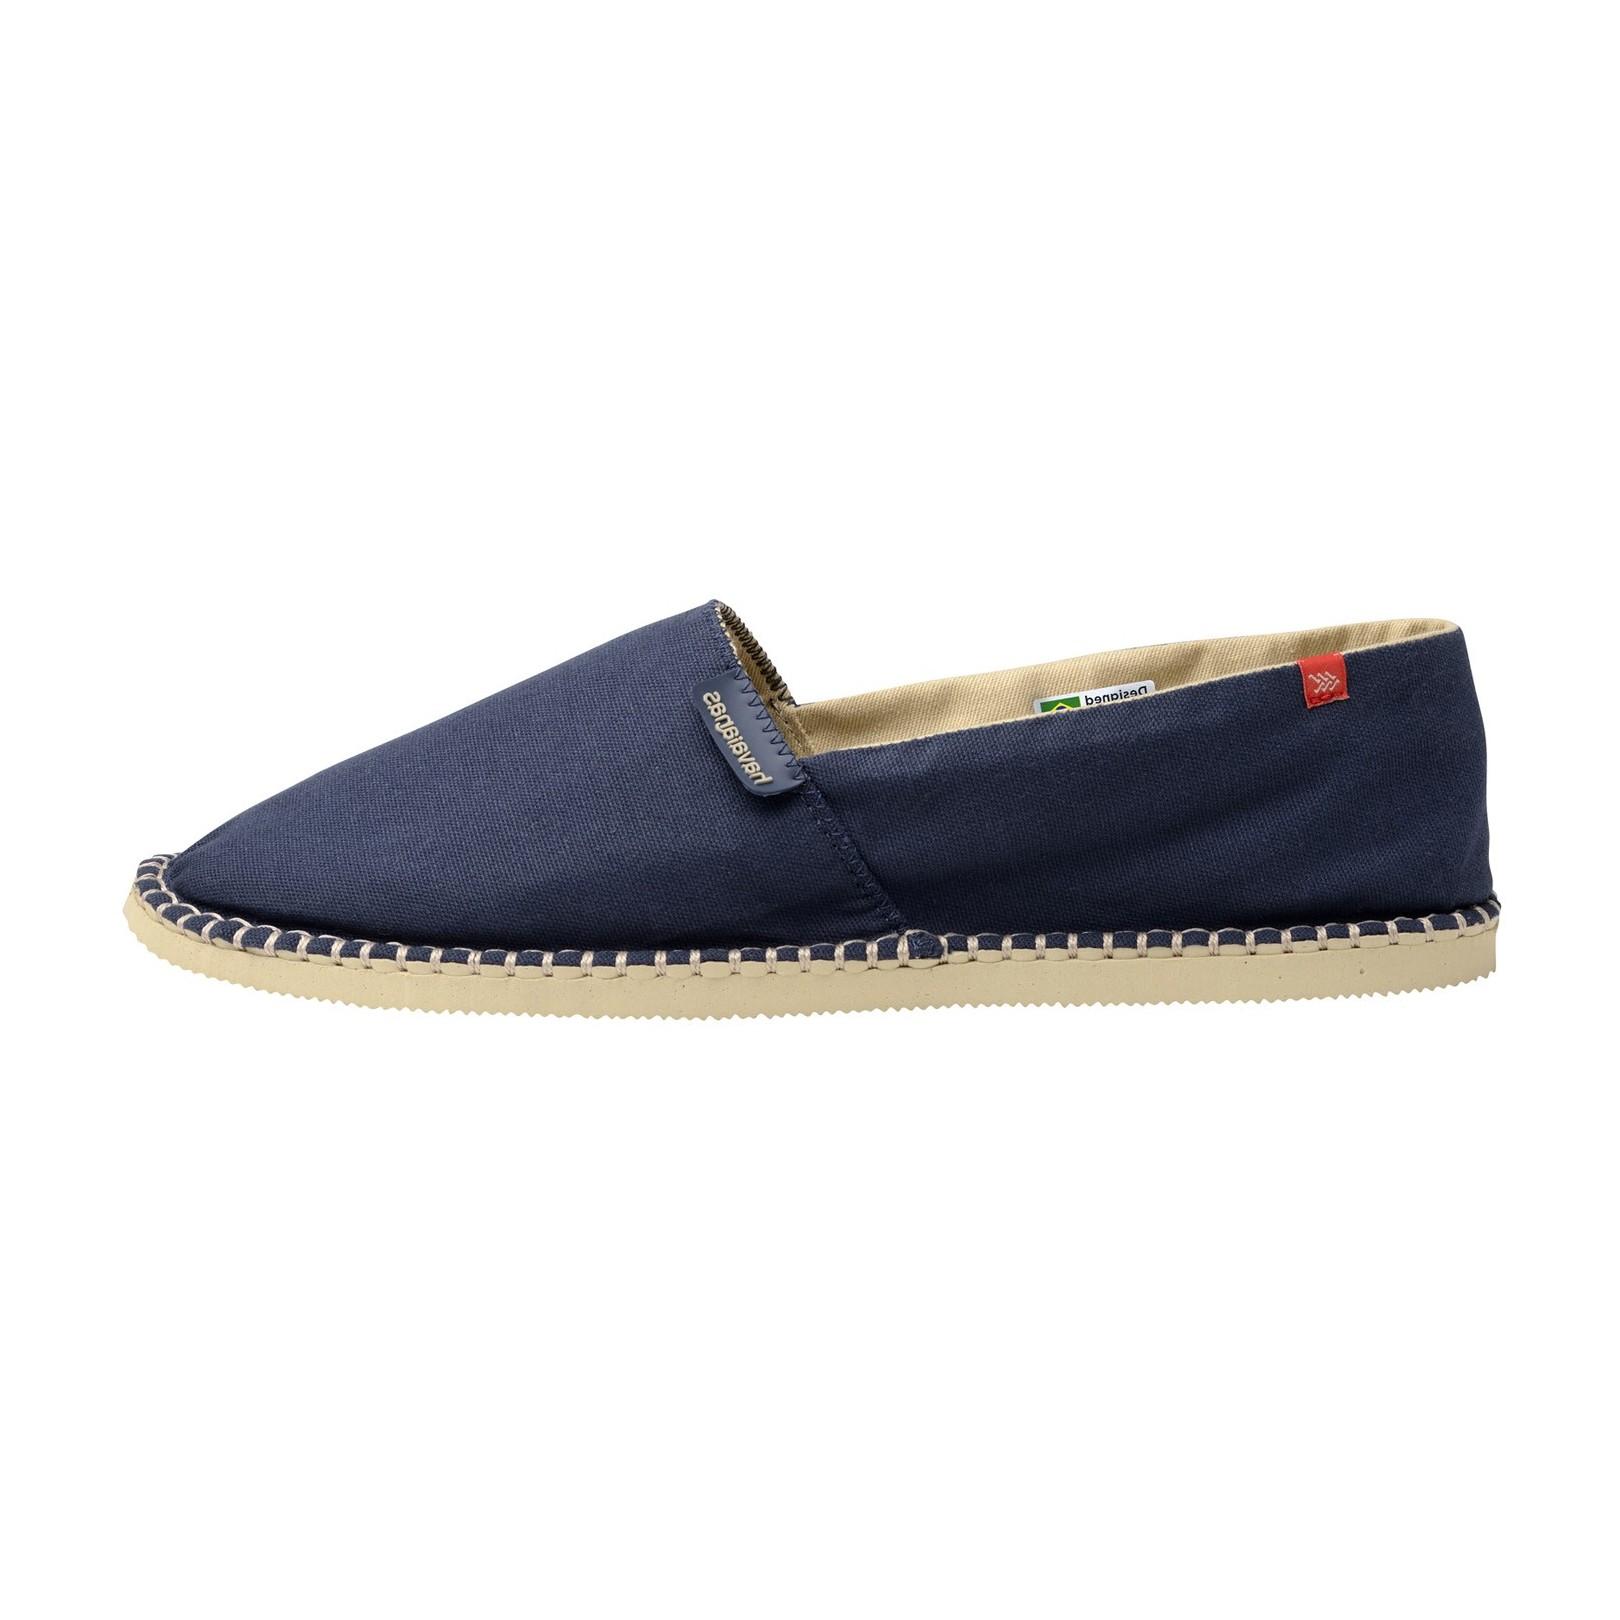 Chaussure espadrilles Havaianas Origine 3 Navy/Sand